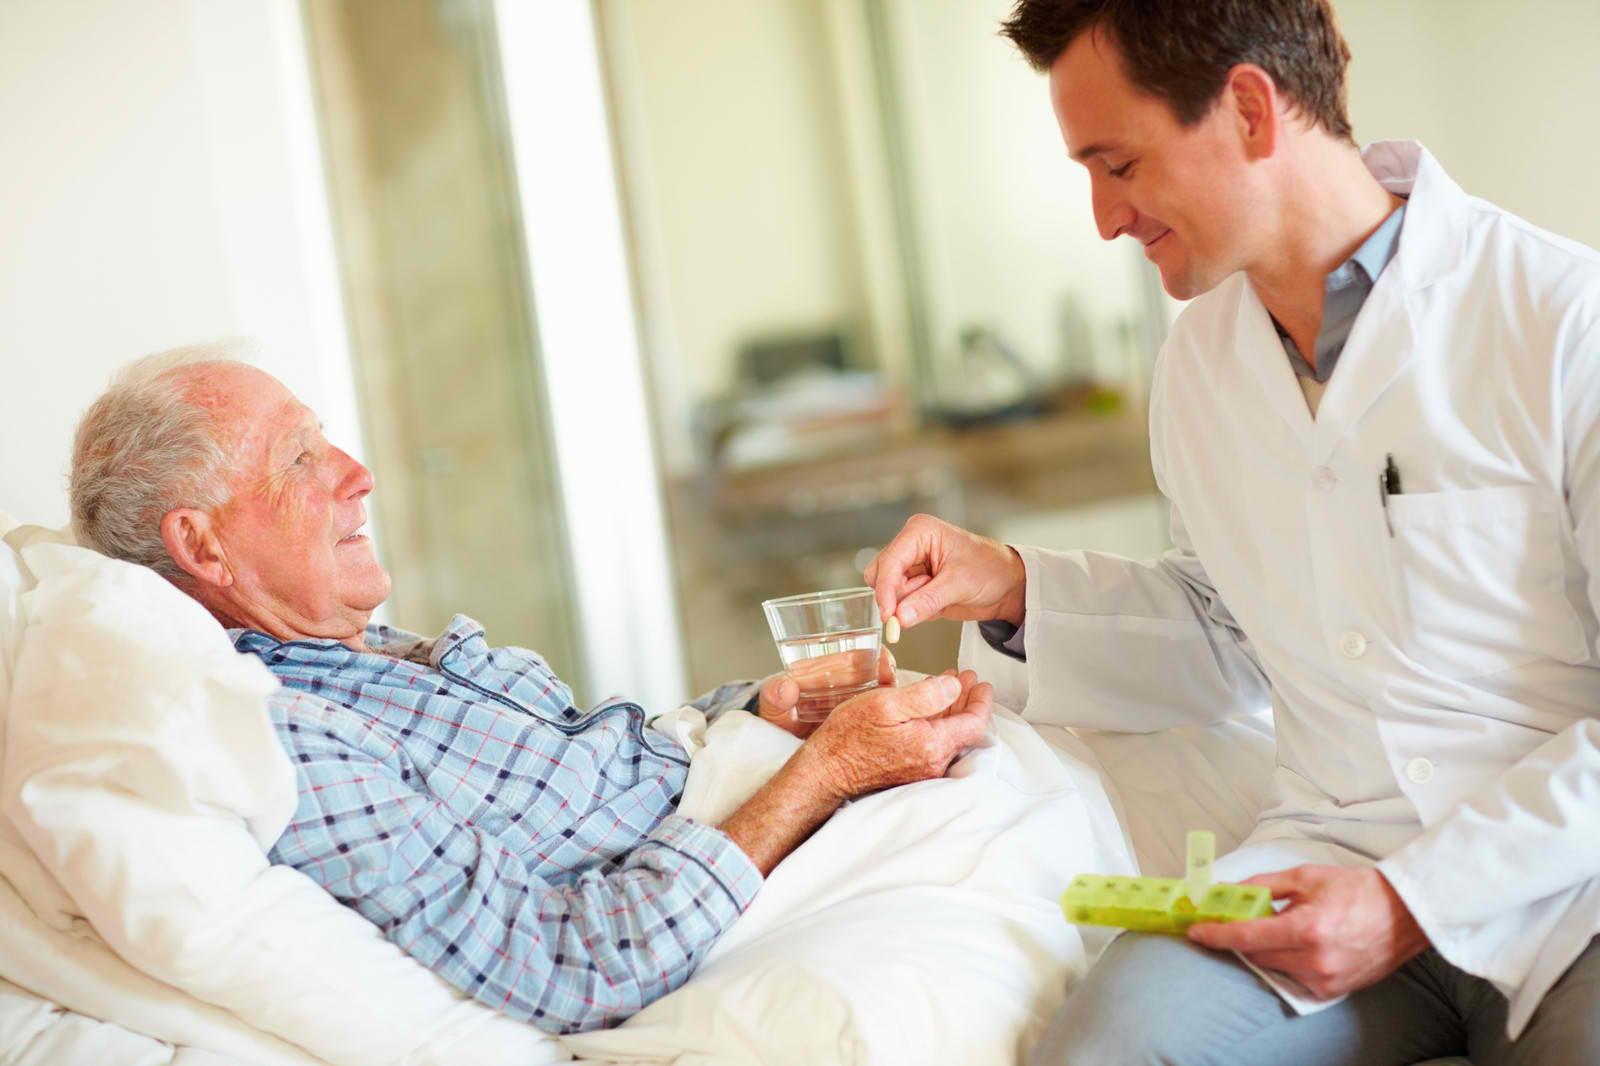 Gabenpentin helps reduce the symptoms of Epilepsy